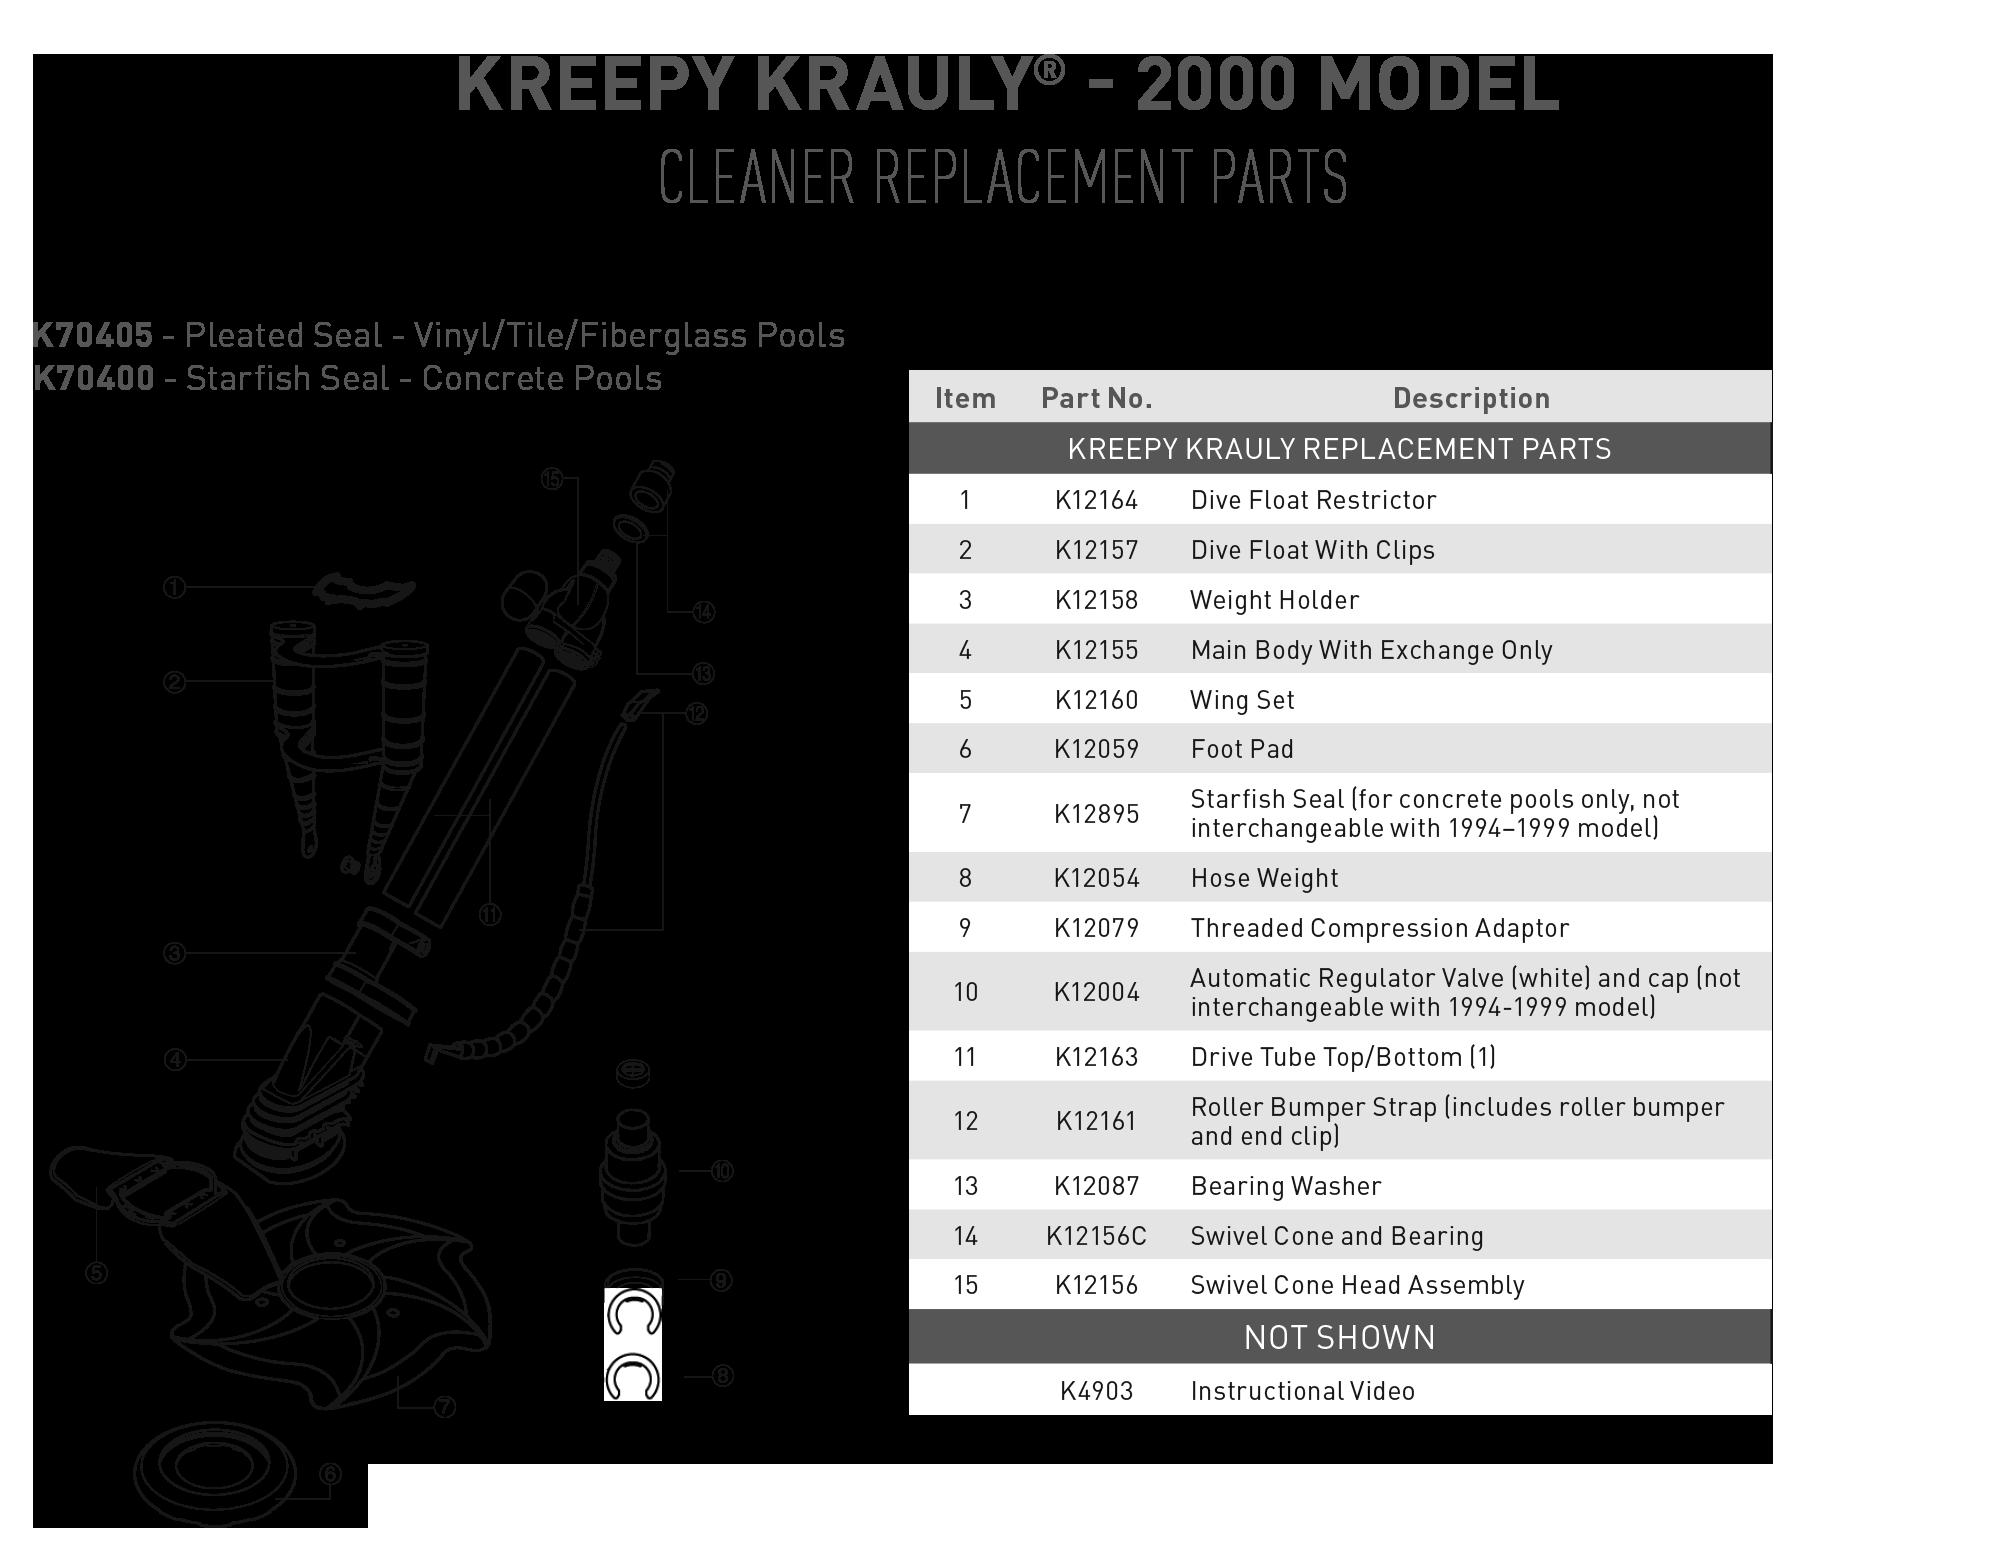 Mermaid Marine Air Wiring Diagram on marine exhaust diagrams, solar power diagrams, marine engine, marine electrical diagrams, marine plumbing diagrams, marine hvac diagrams, trailer diagrams, big architects diagrams, marine drawings, marine wiring color code chart, marine transmission diagrams, speaker diagrams,